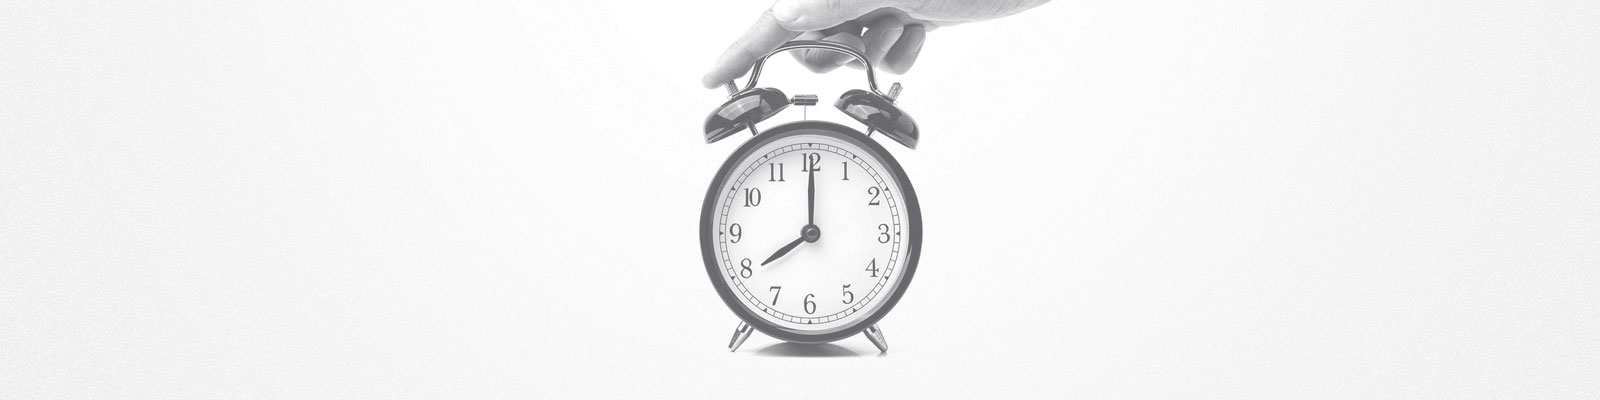 Spiritual Procrastination